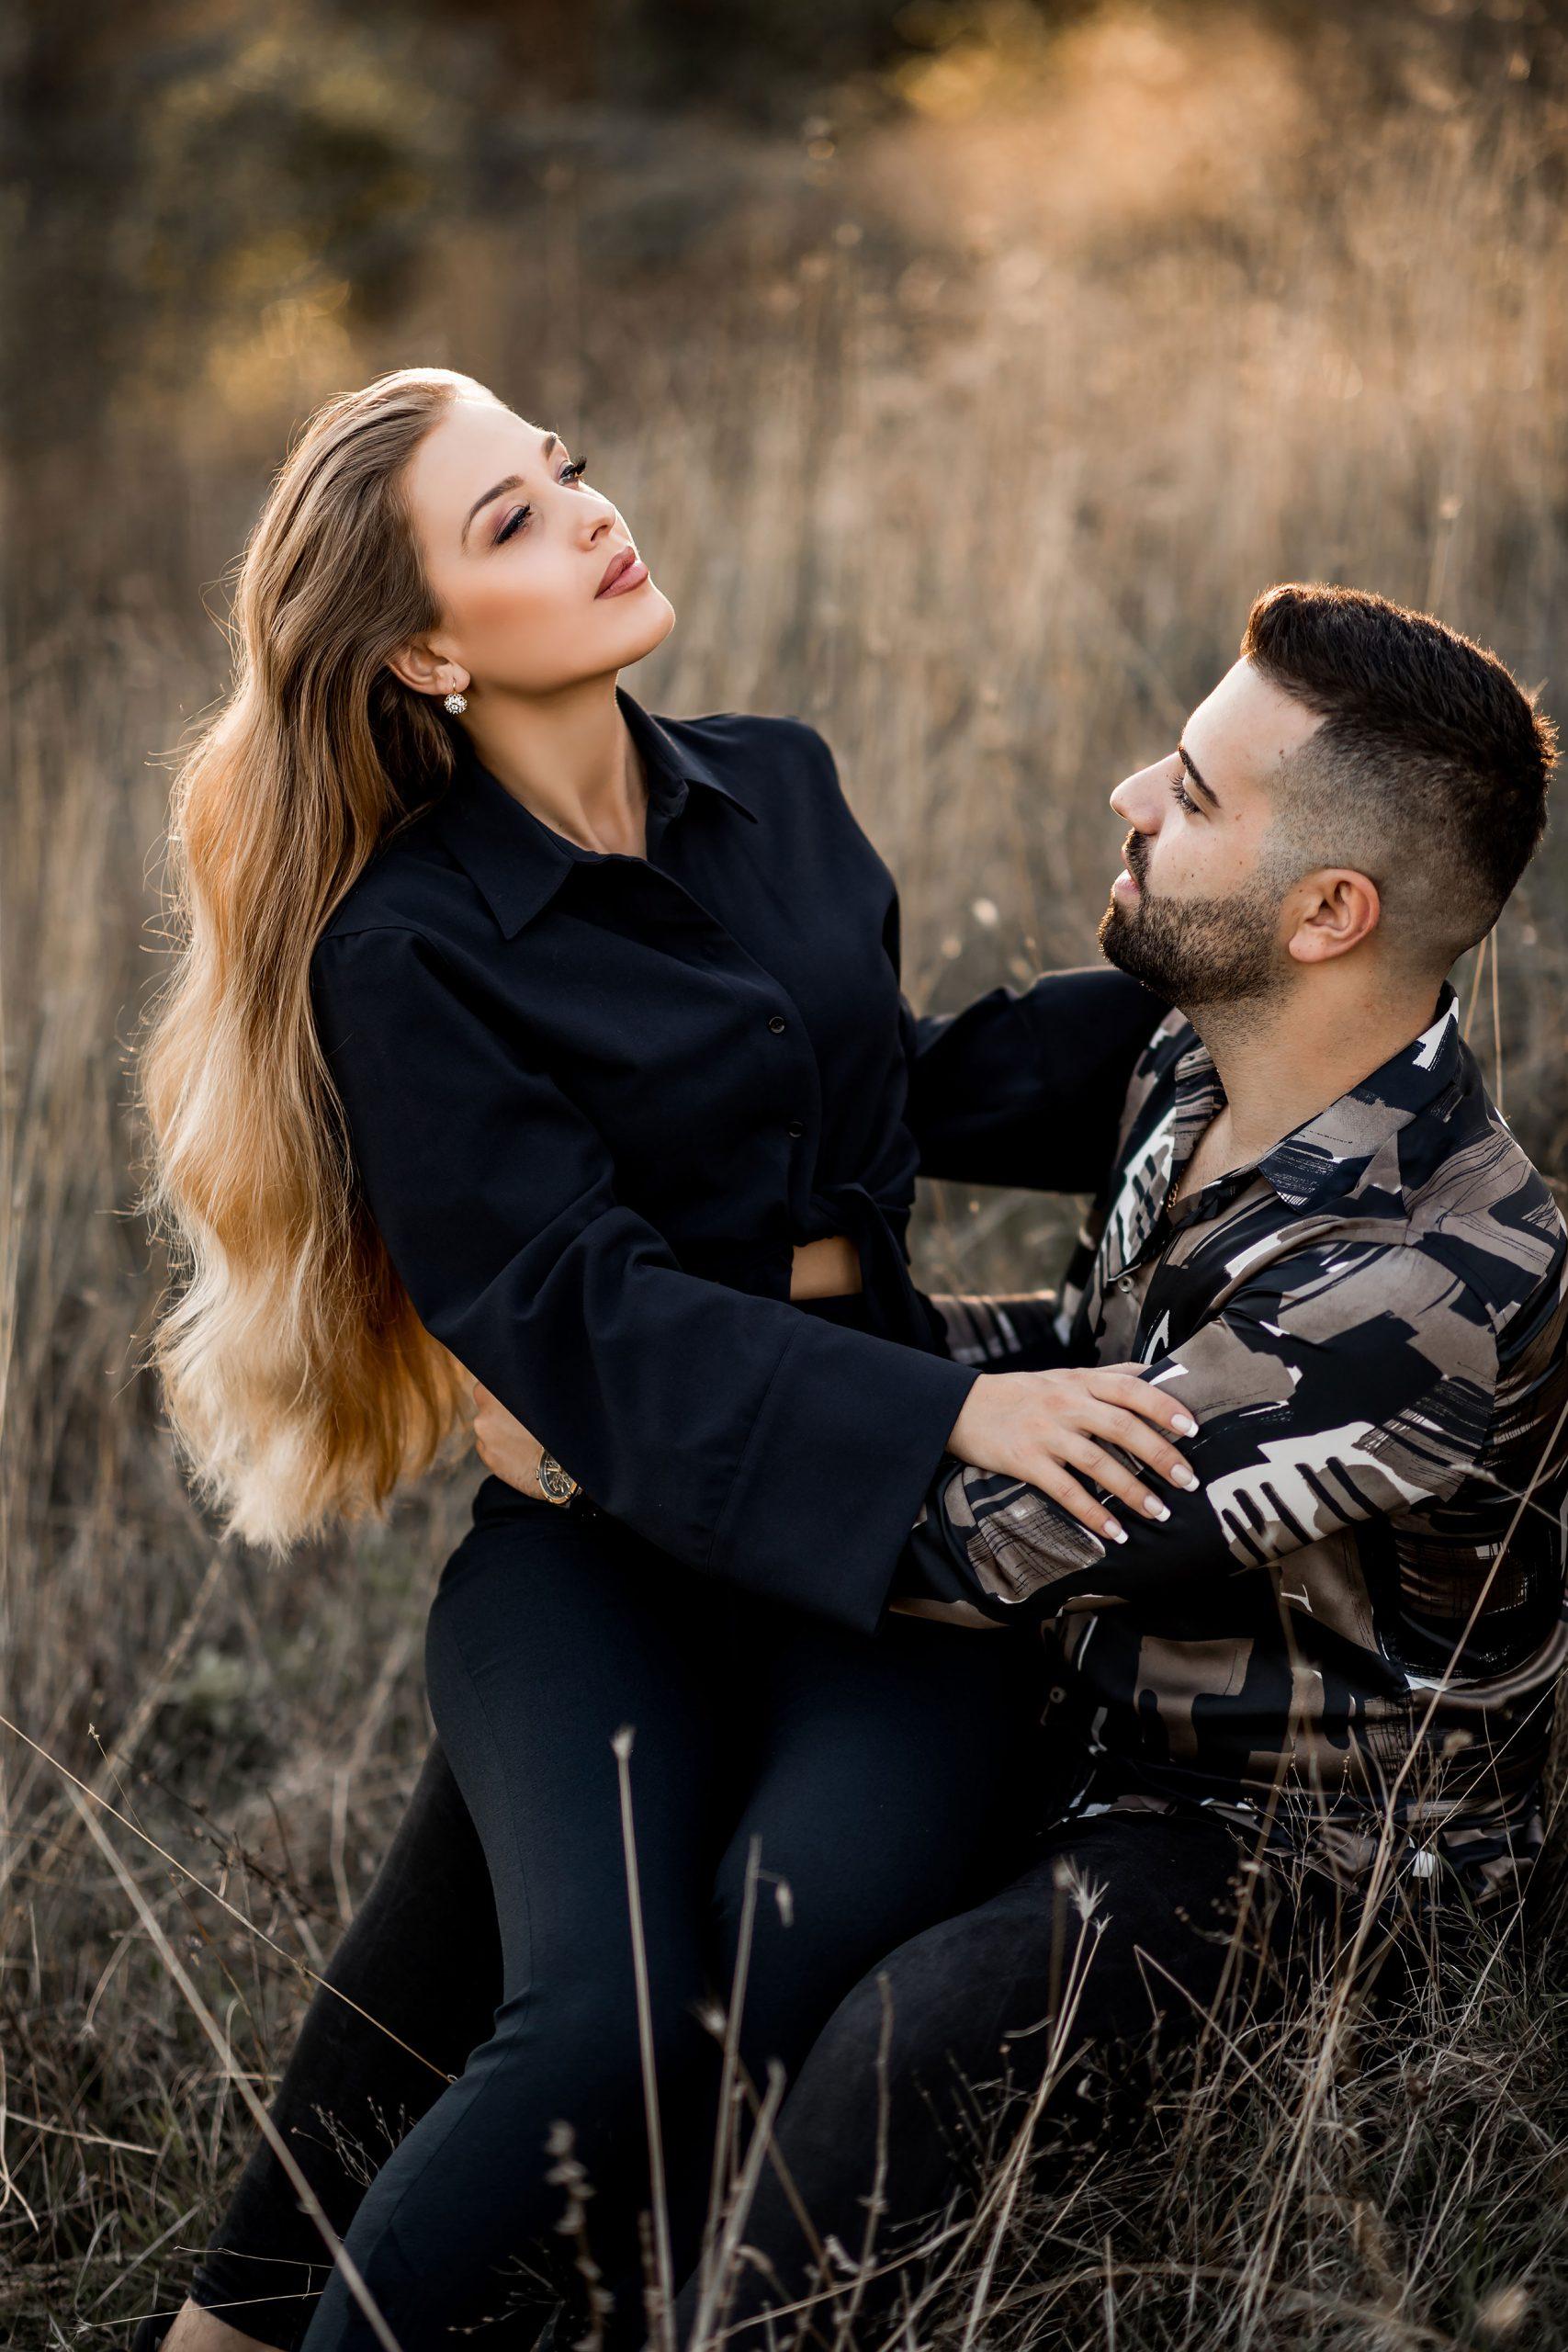 Couples nature photoshoot